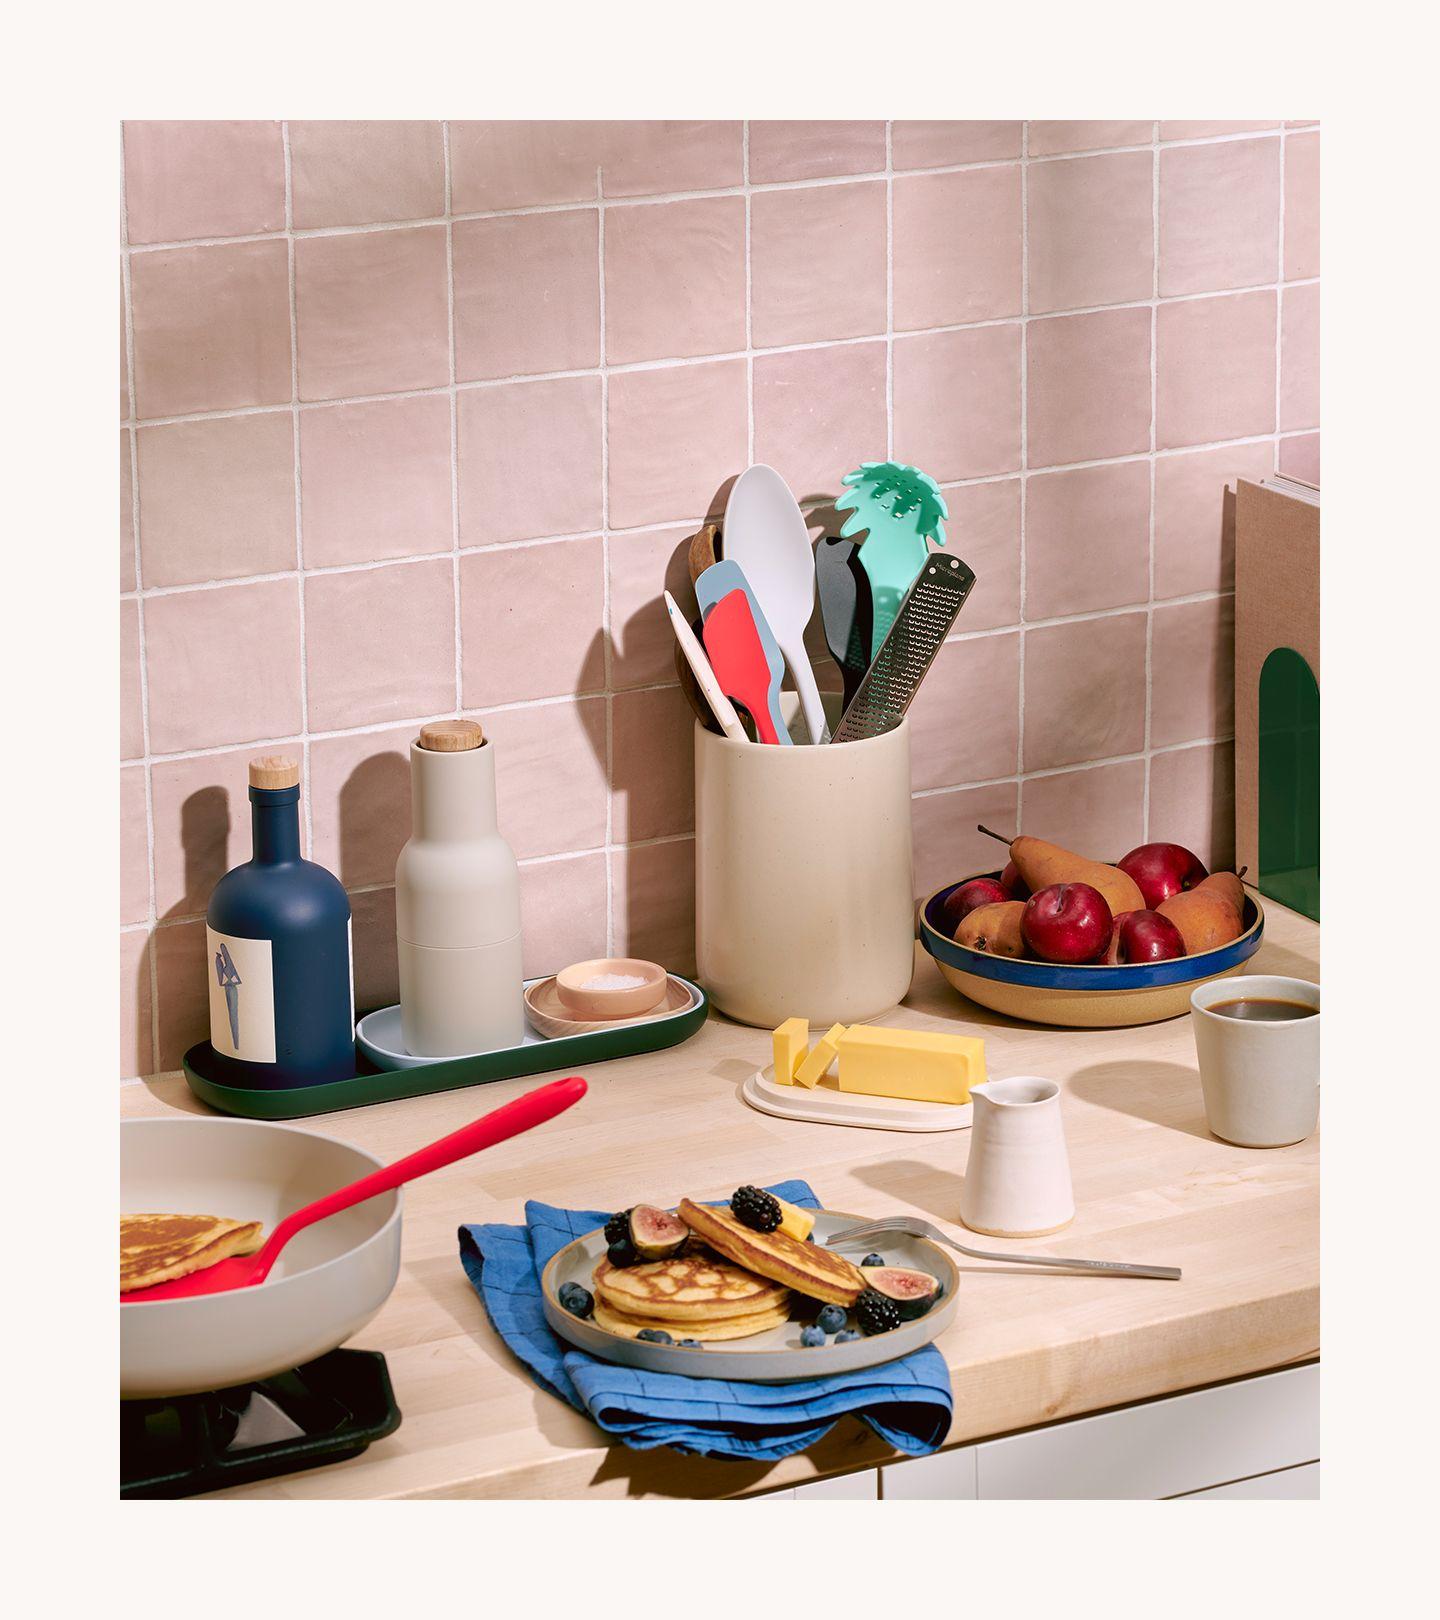 GIR Kitchen Tools in Situ